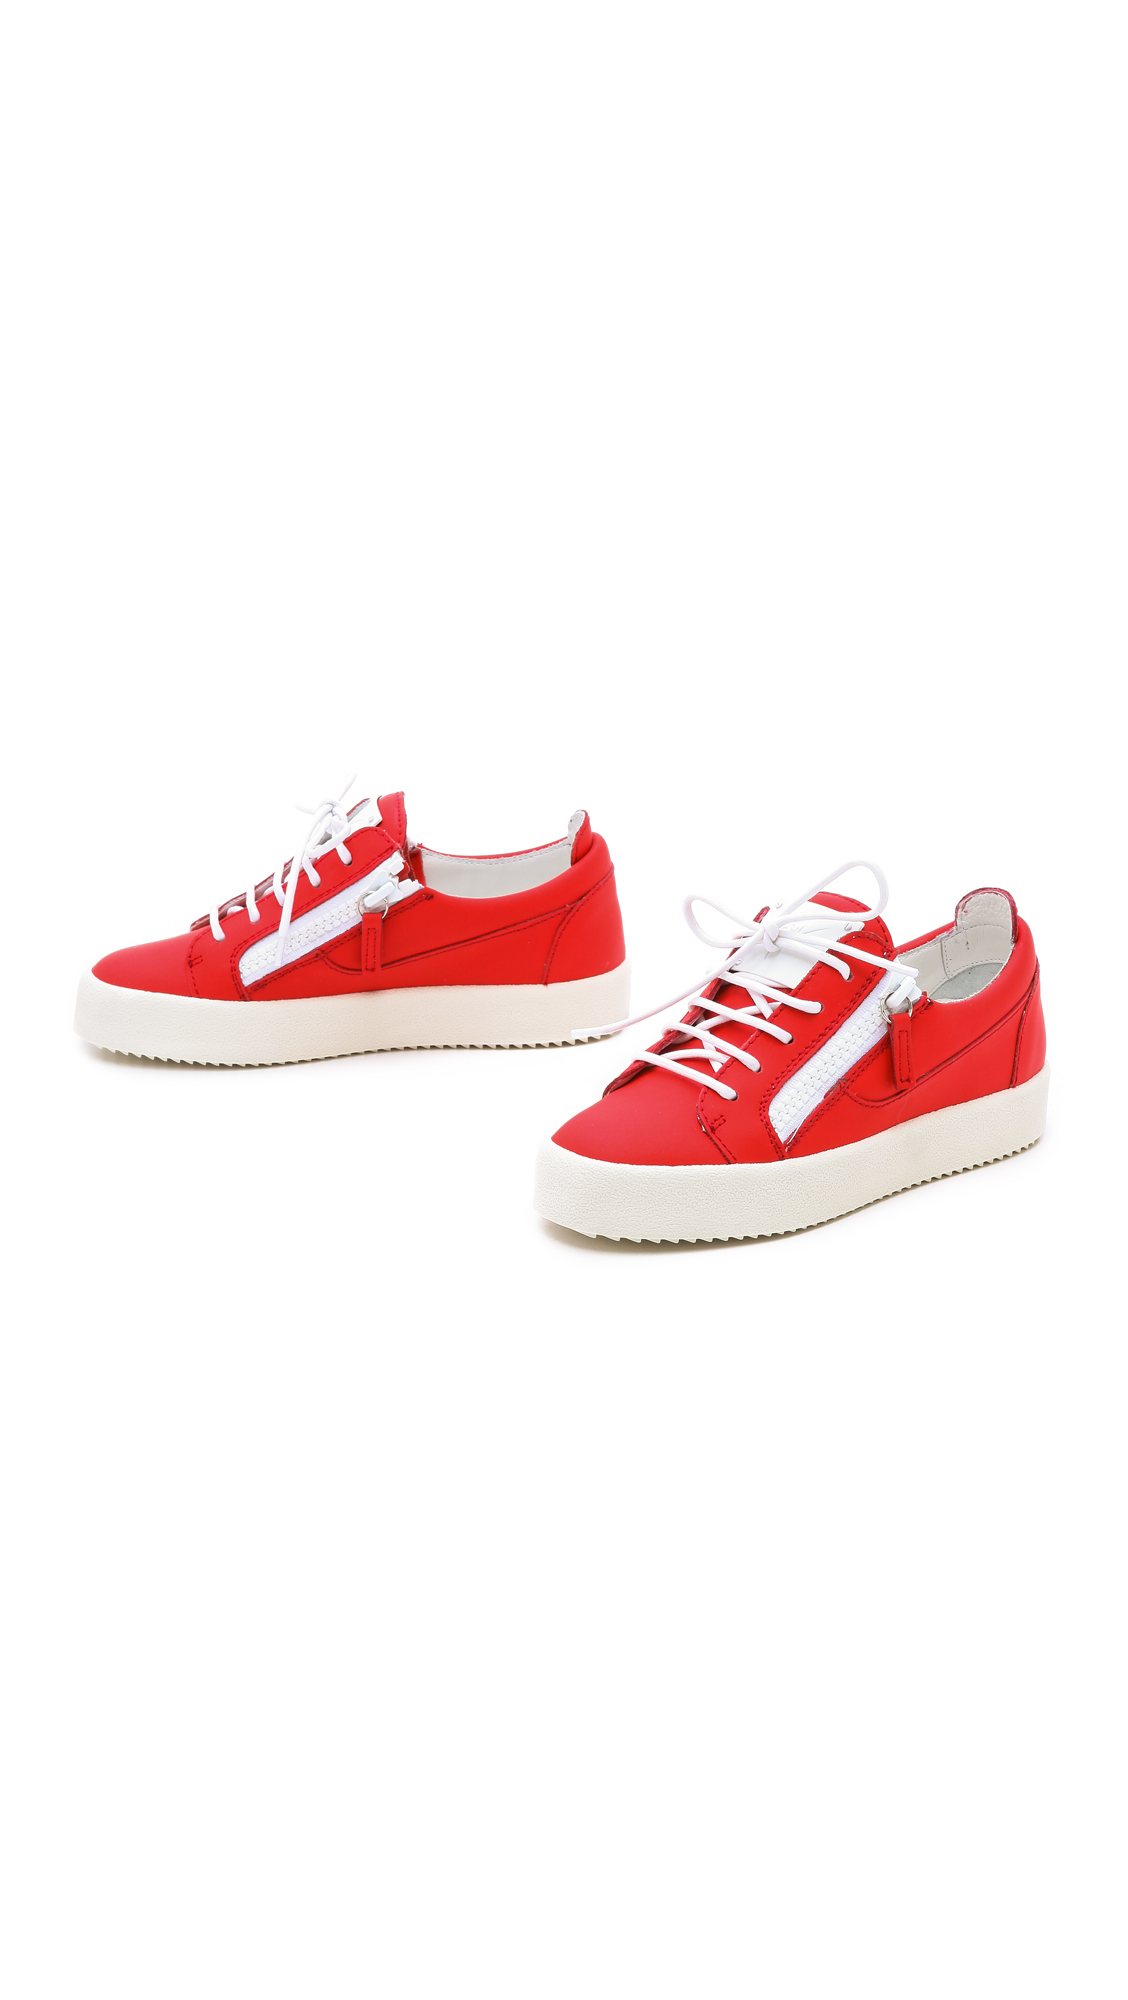 Giuseppe Zanotti Zip Low Top Sneakers - Red